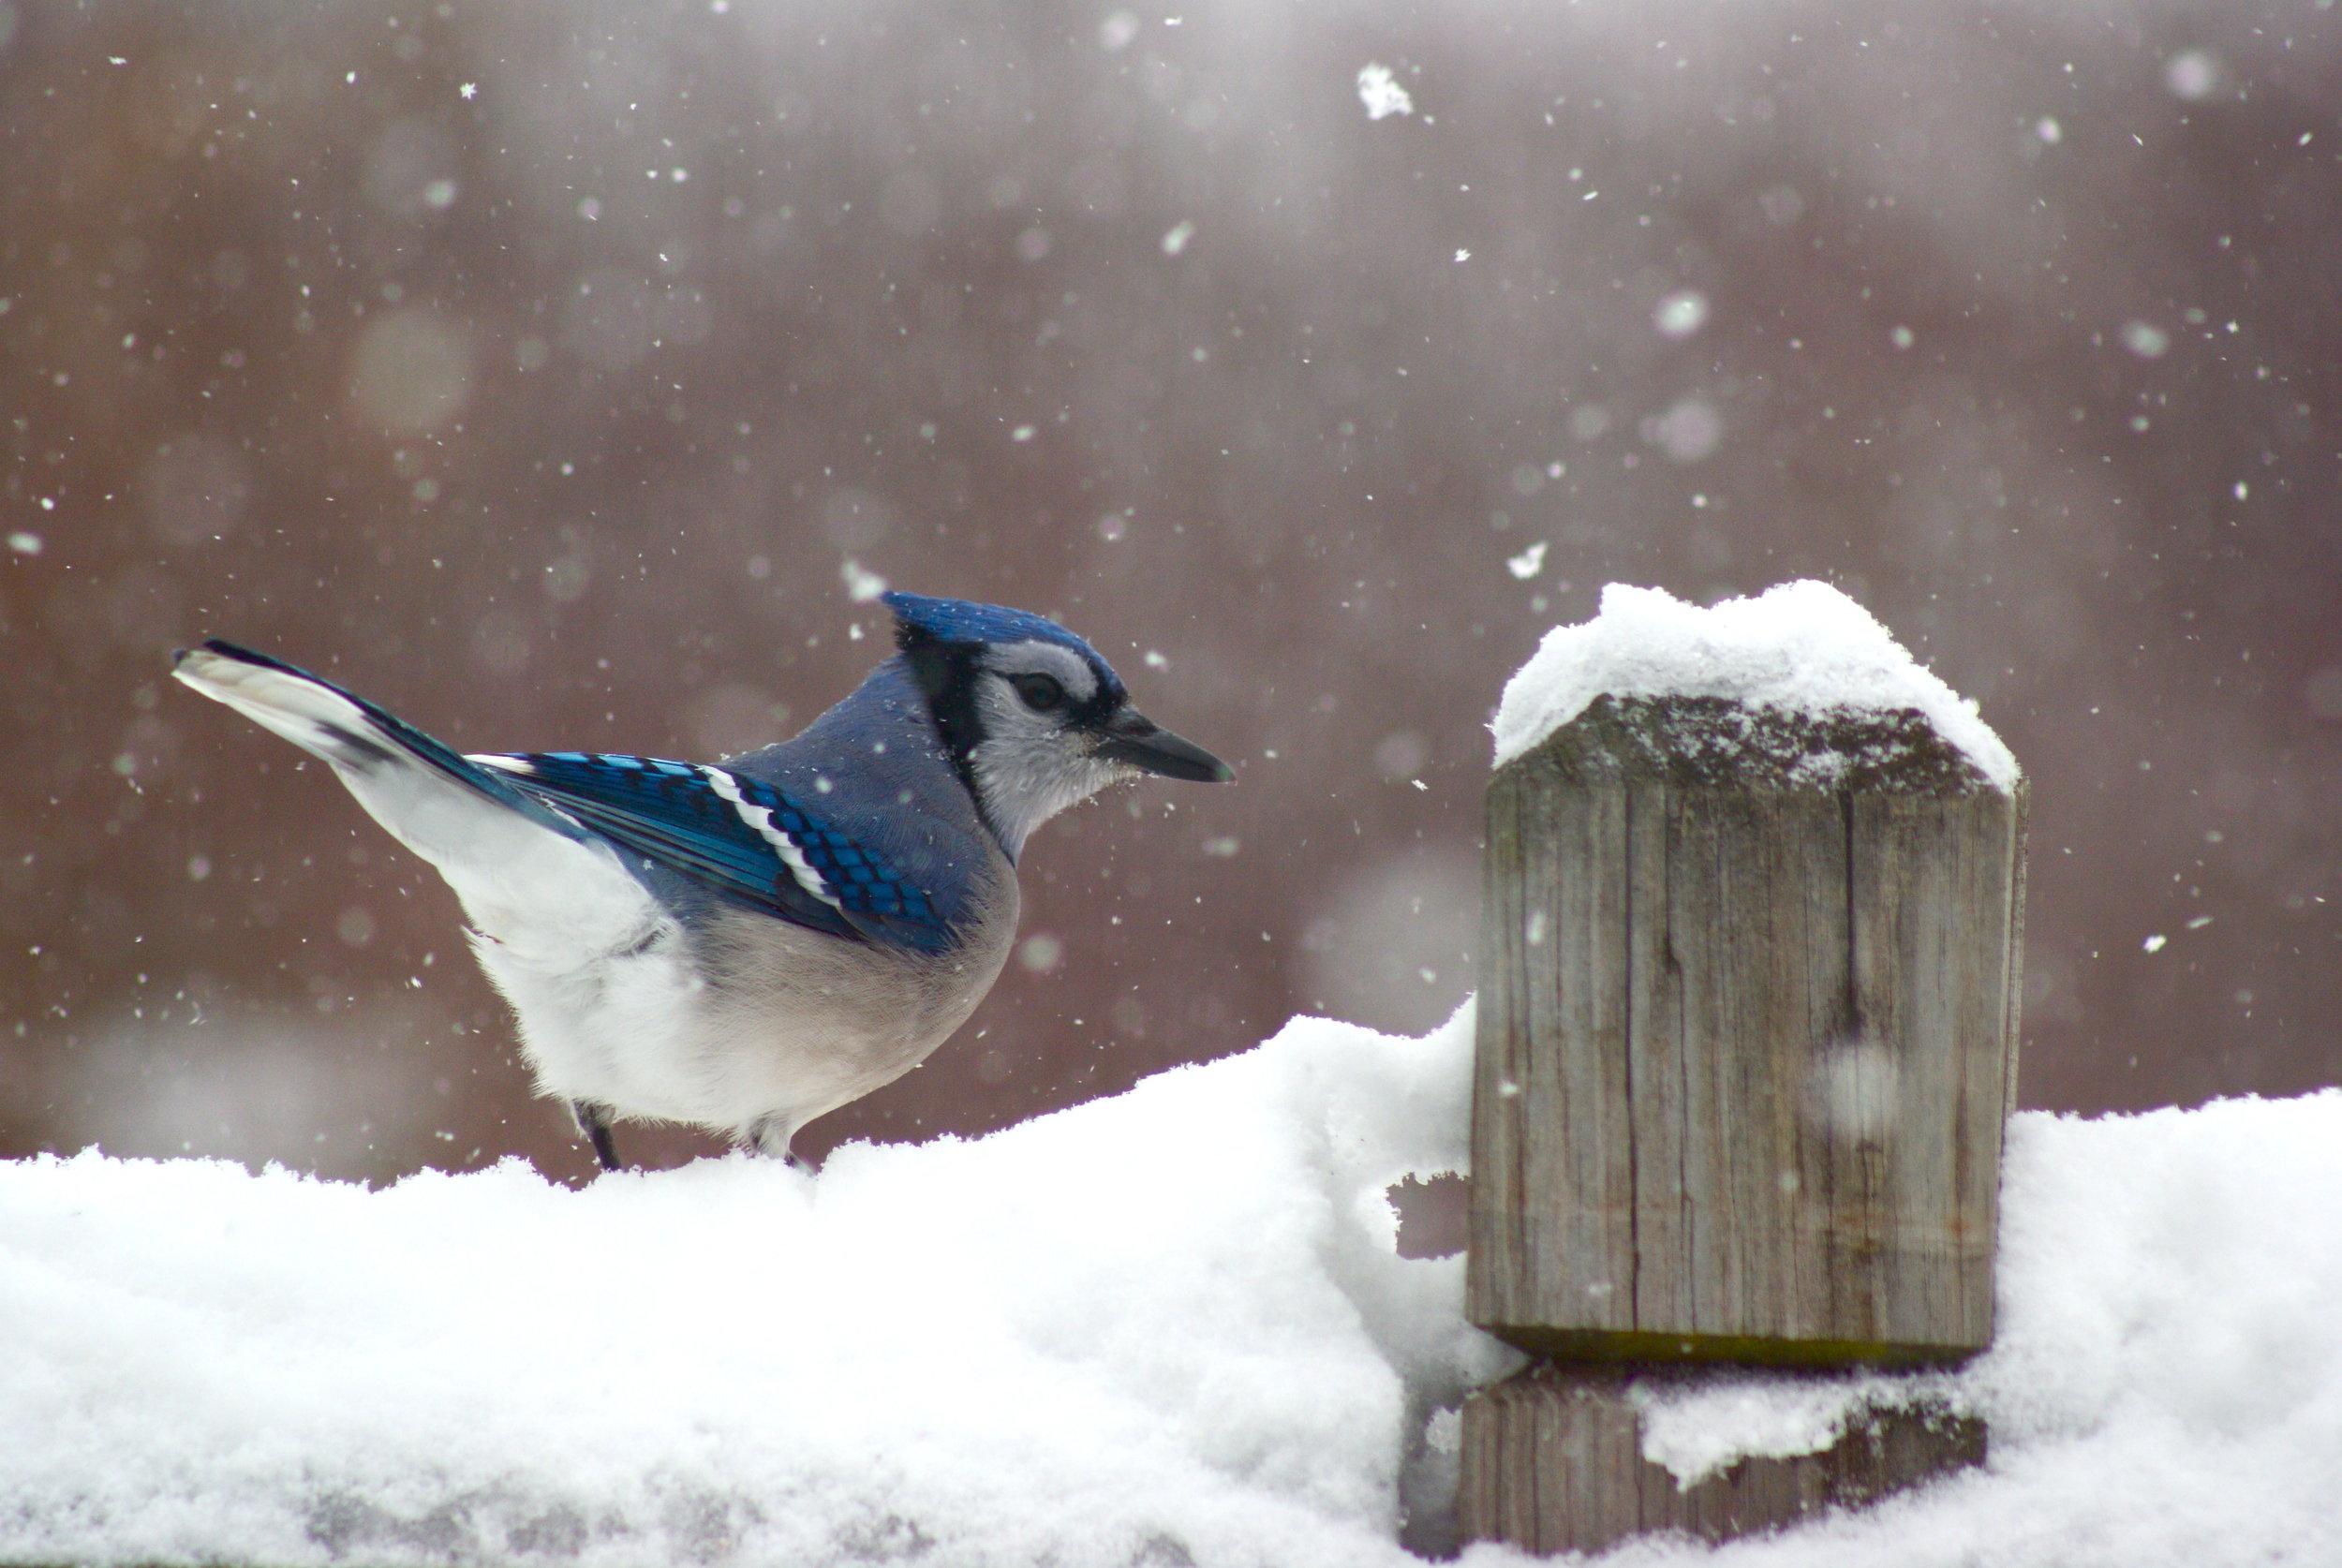 Snowy Blue Jay